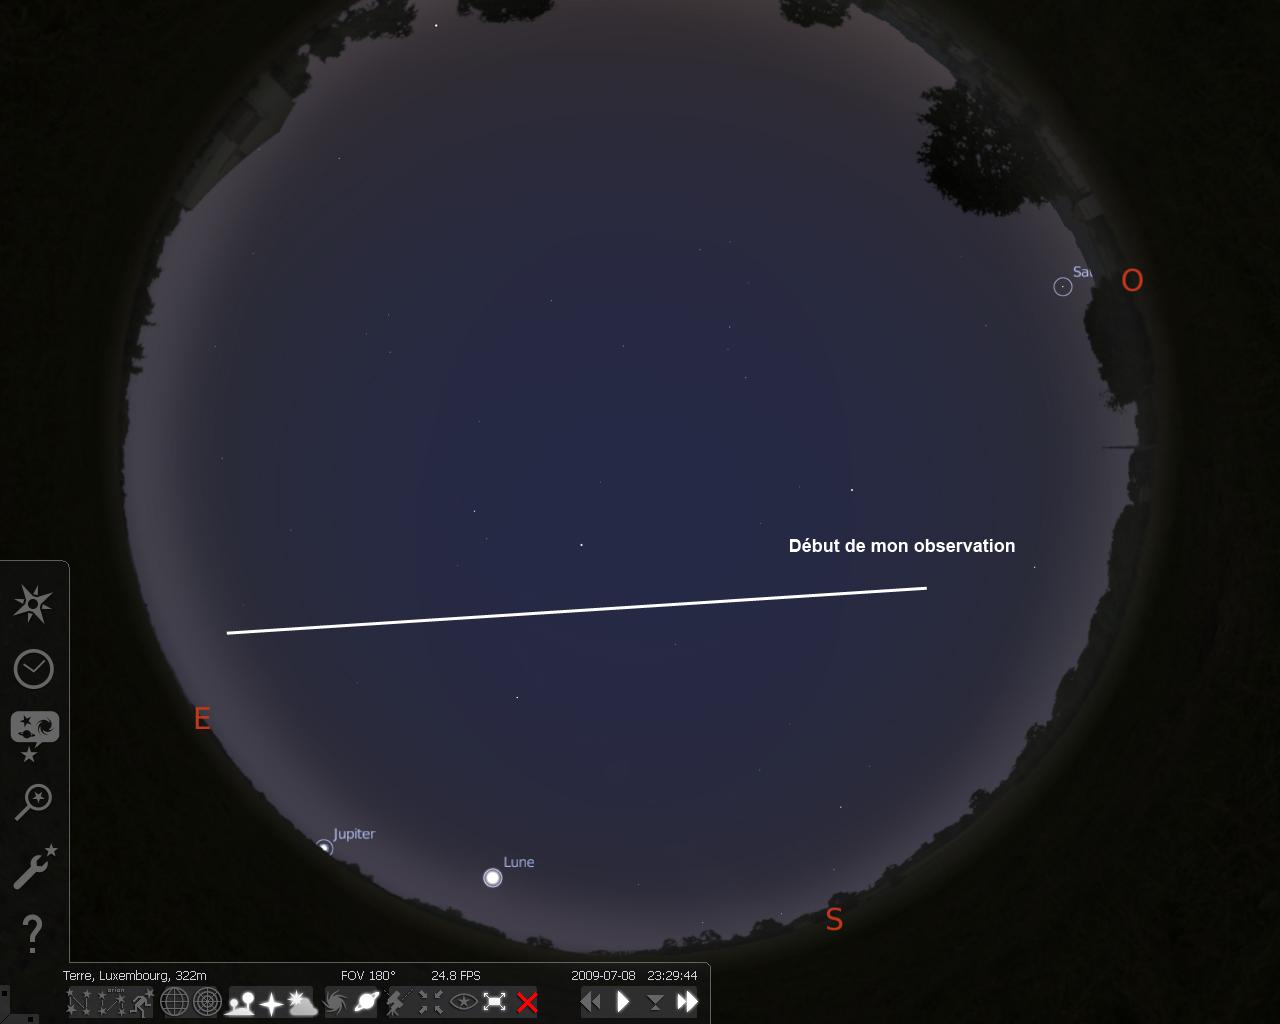 (ISS) 08/07/2009 - Observation d'un objet Lumineux - Luxembourg Plan1